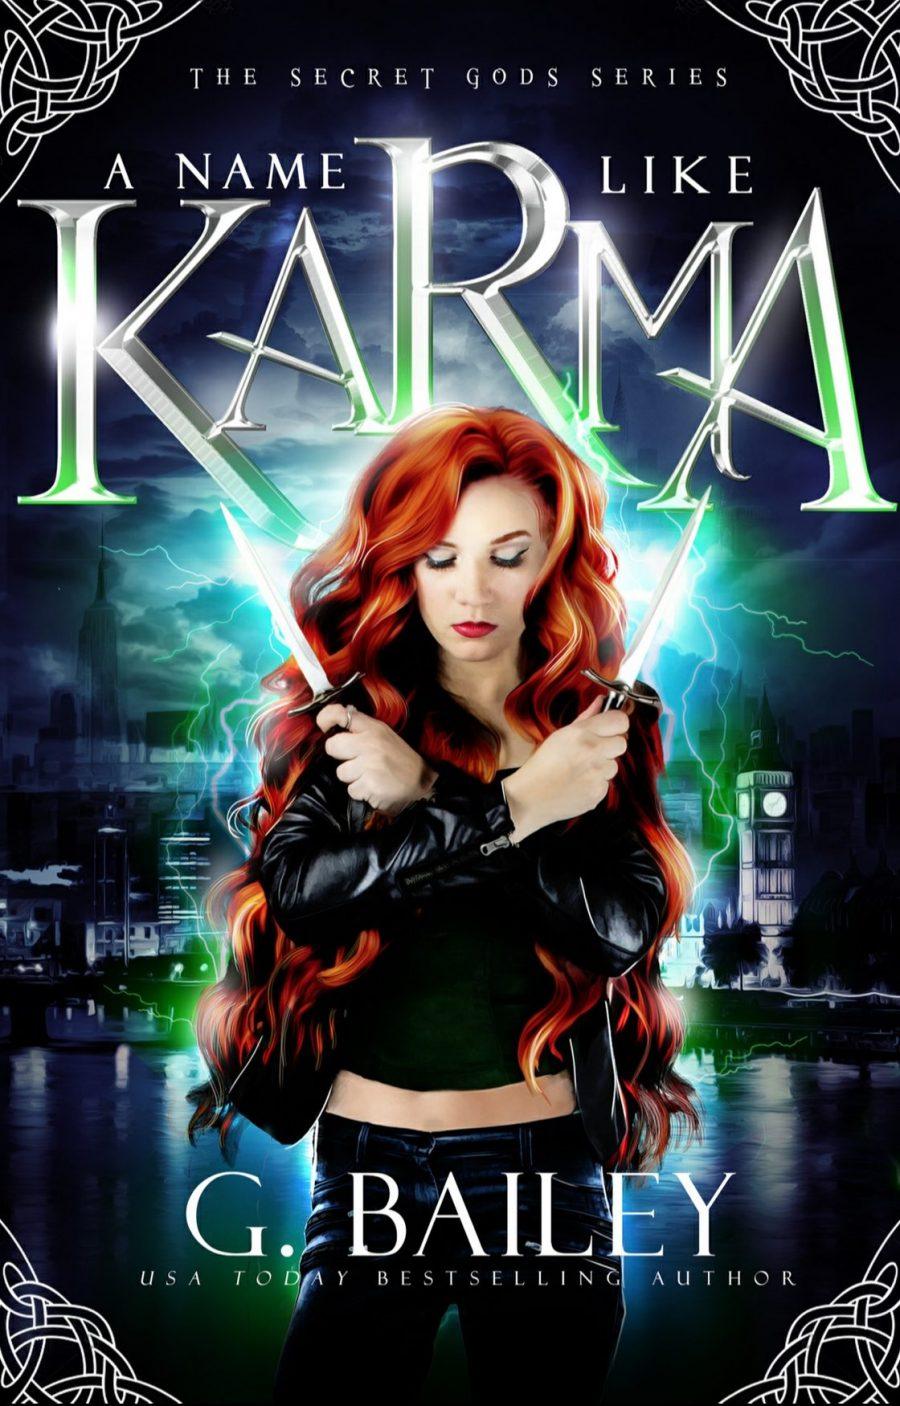 A Name Like Karma by G. Bailey - A Book Review #BookReview #RH #WhyChoose #ReverseHarem #PNR #Paranormal #SlowBurn #Gods